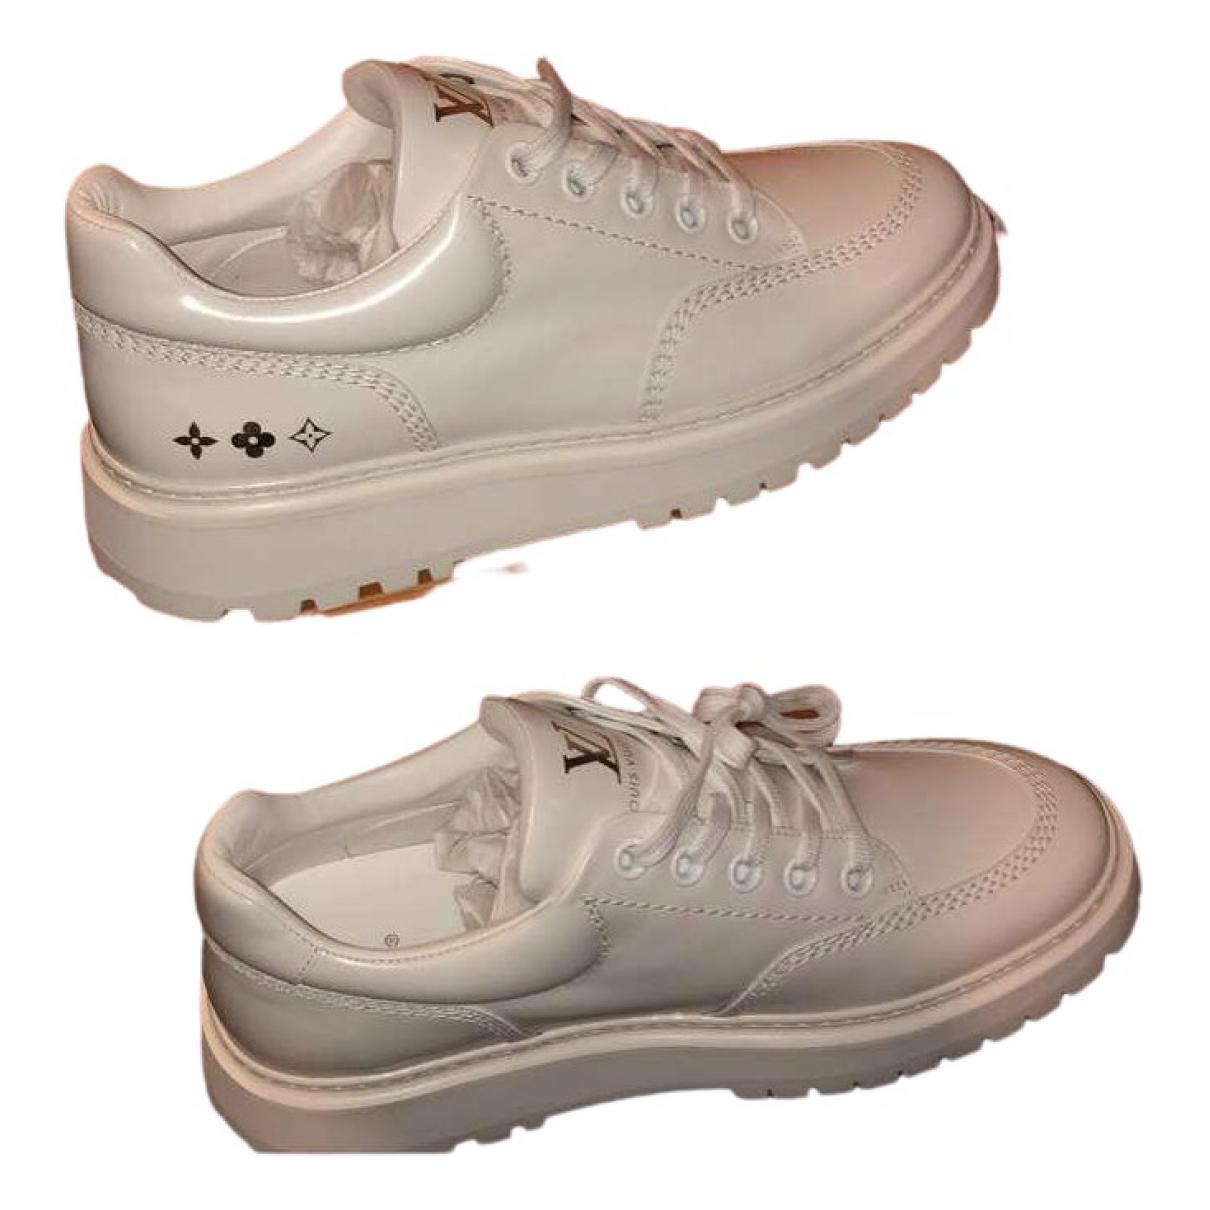 Louis Vuitton \N Sneakers in  Weiss Lackleder